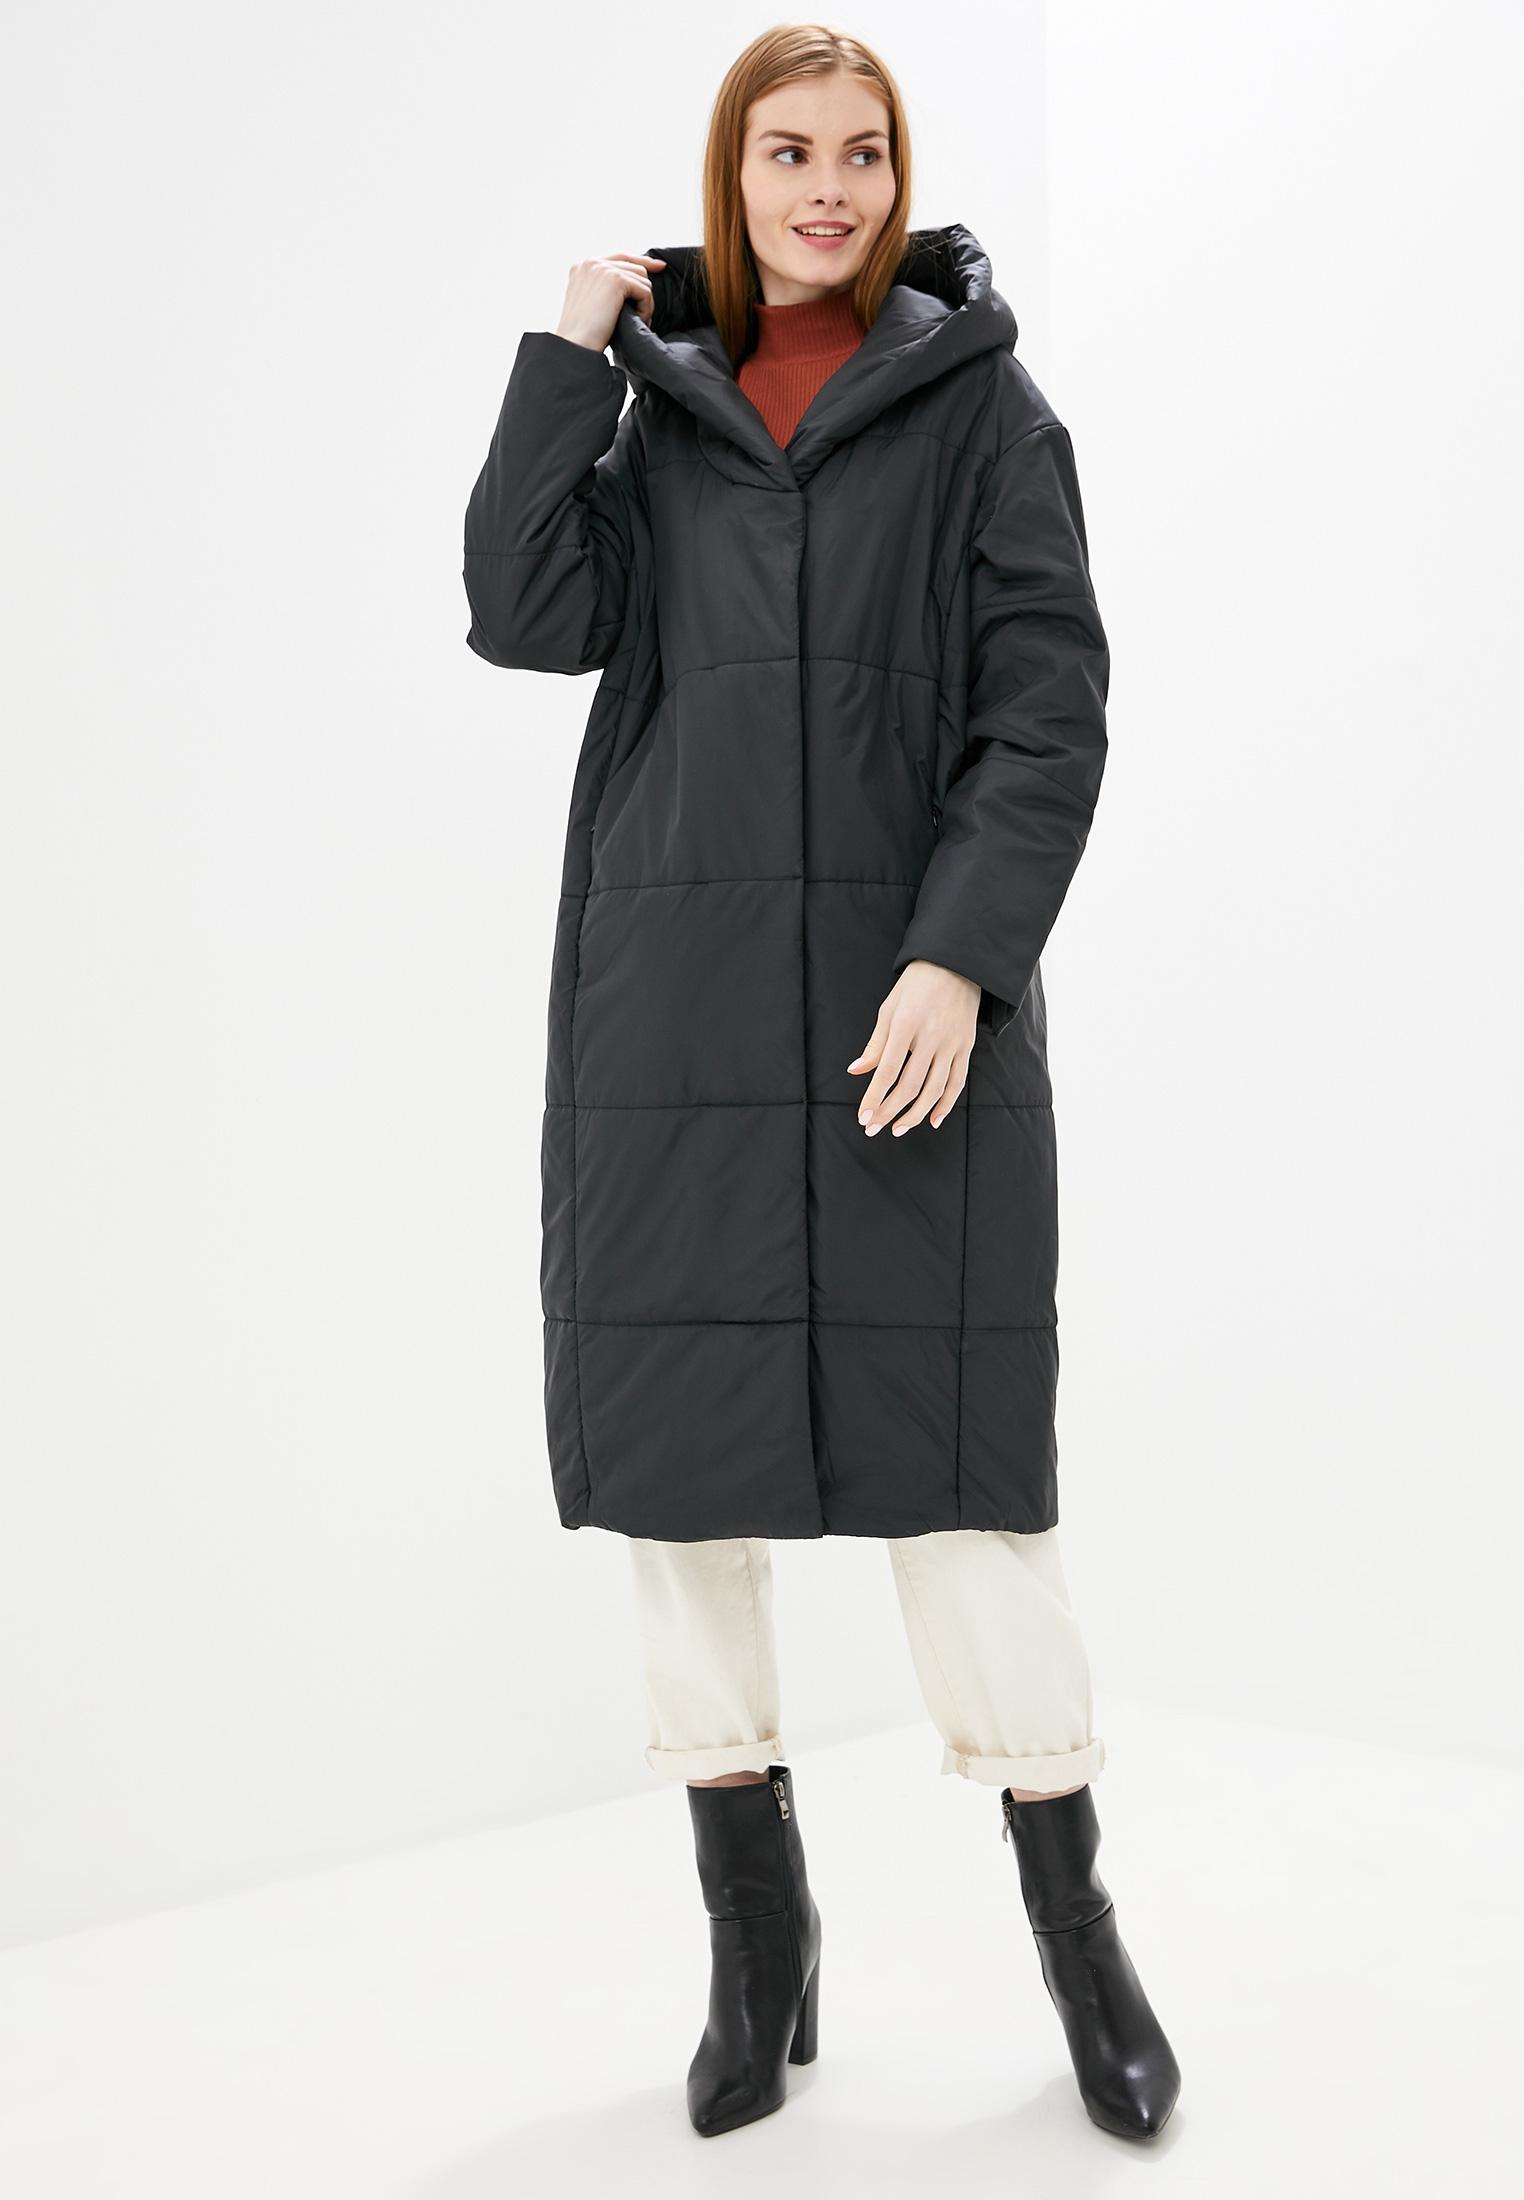 Куртка утепленная, Tom Farr, цвет: черный. Артикул: MP002XW1GEID. Одежда / Верхняя одежда